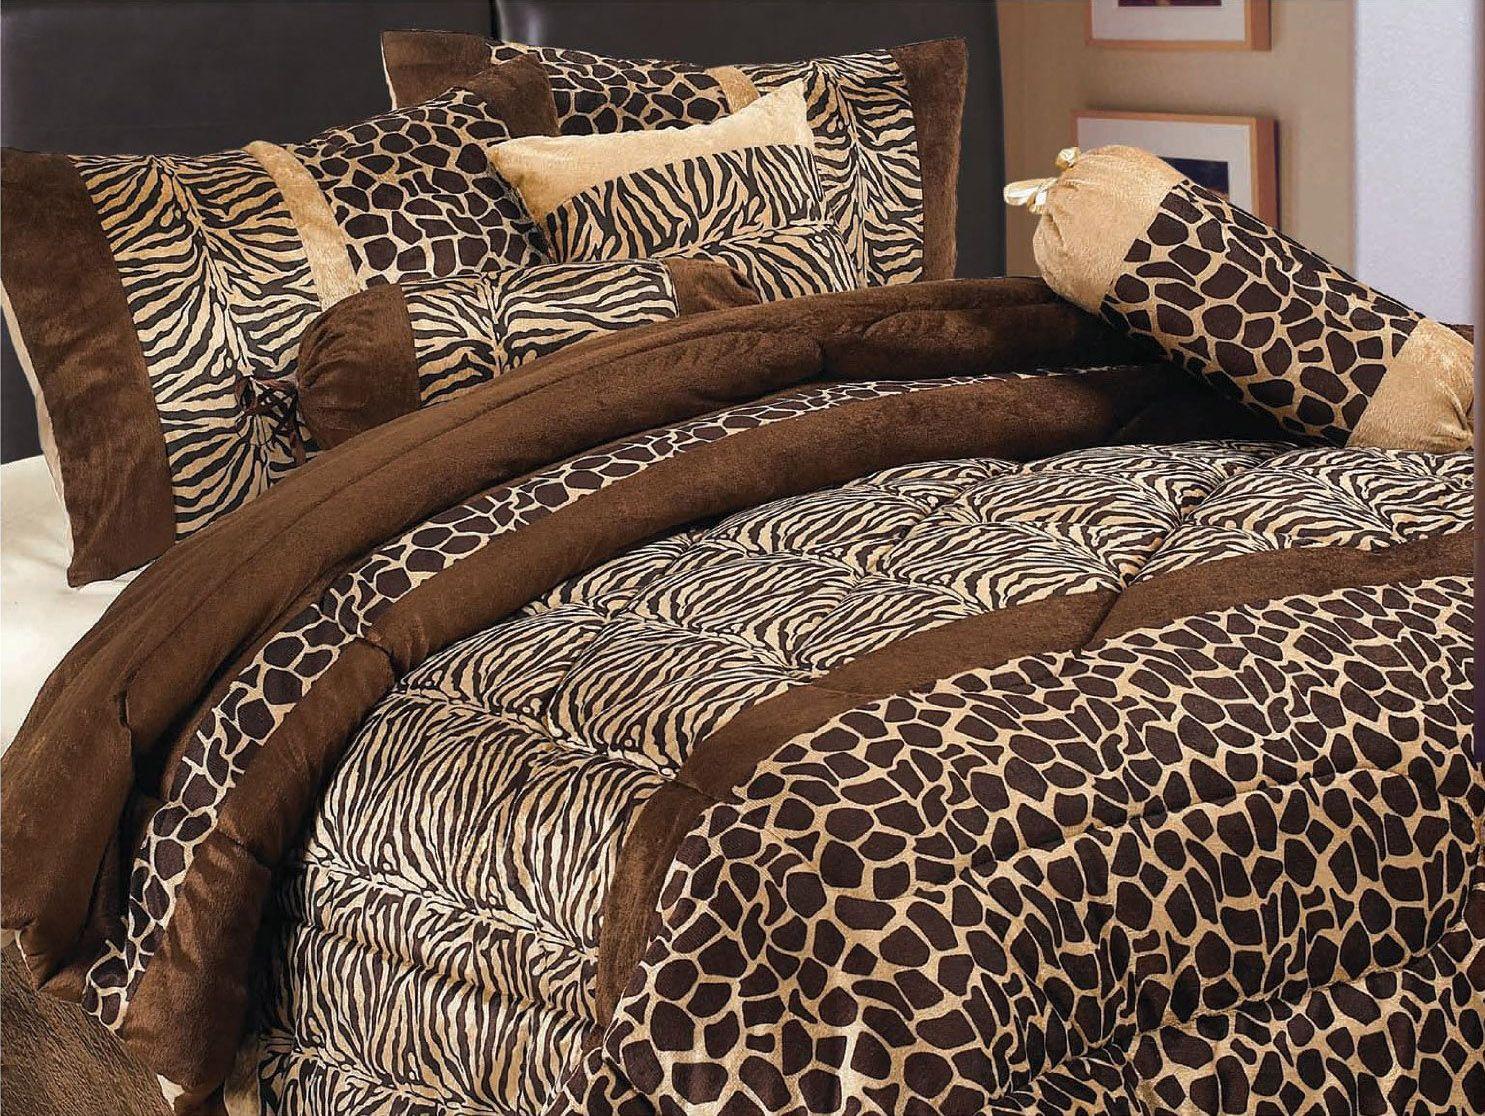 7 Piece Safari Zebra Giraffe Print Brown Micro Fur Comforter